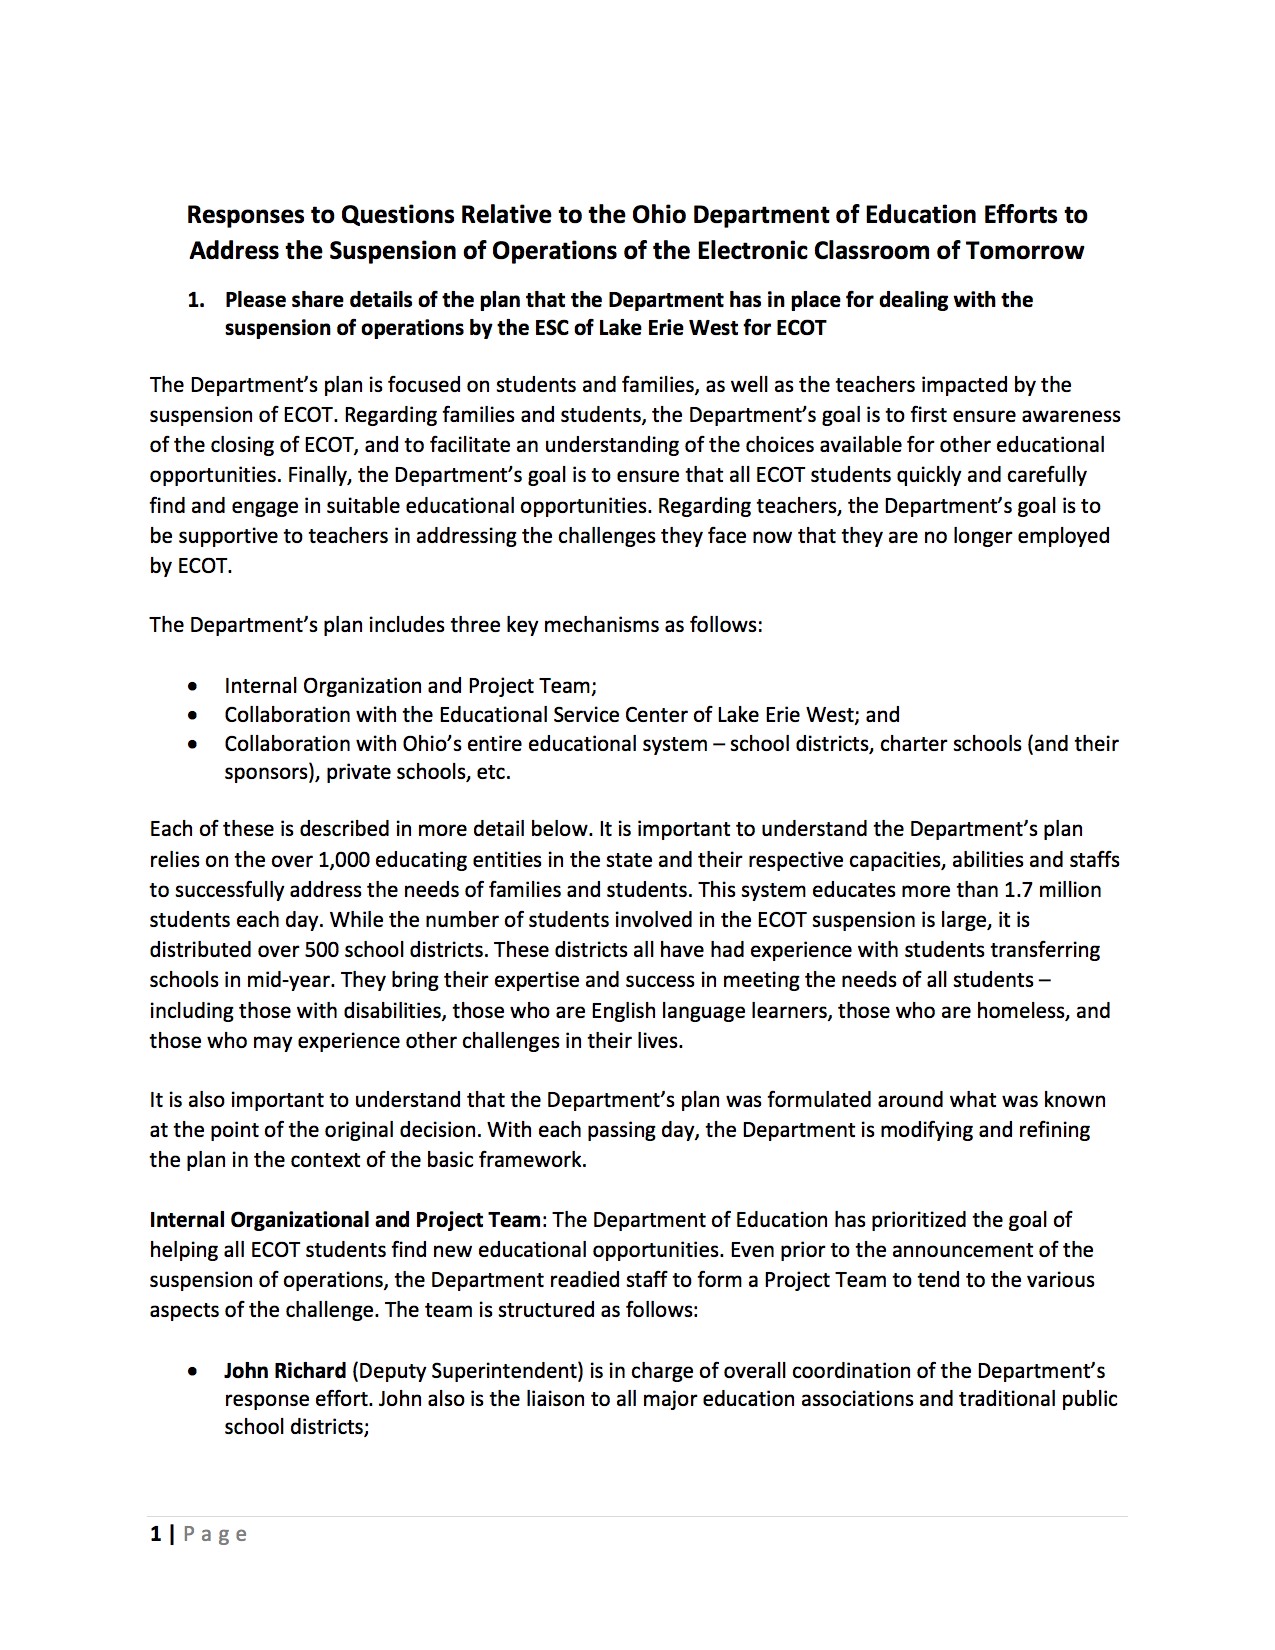 Response to Gov Kasich Questions-FINAL.jpg